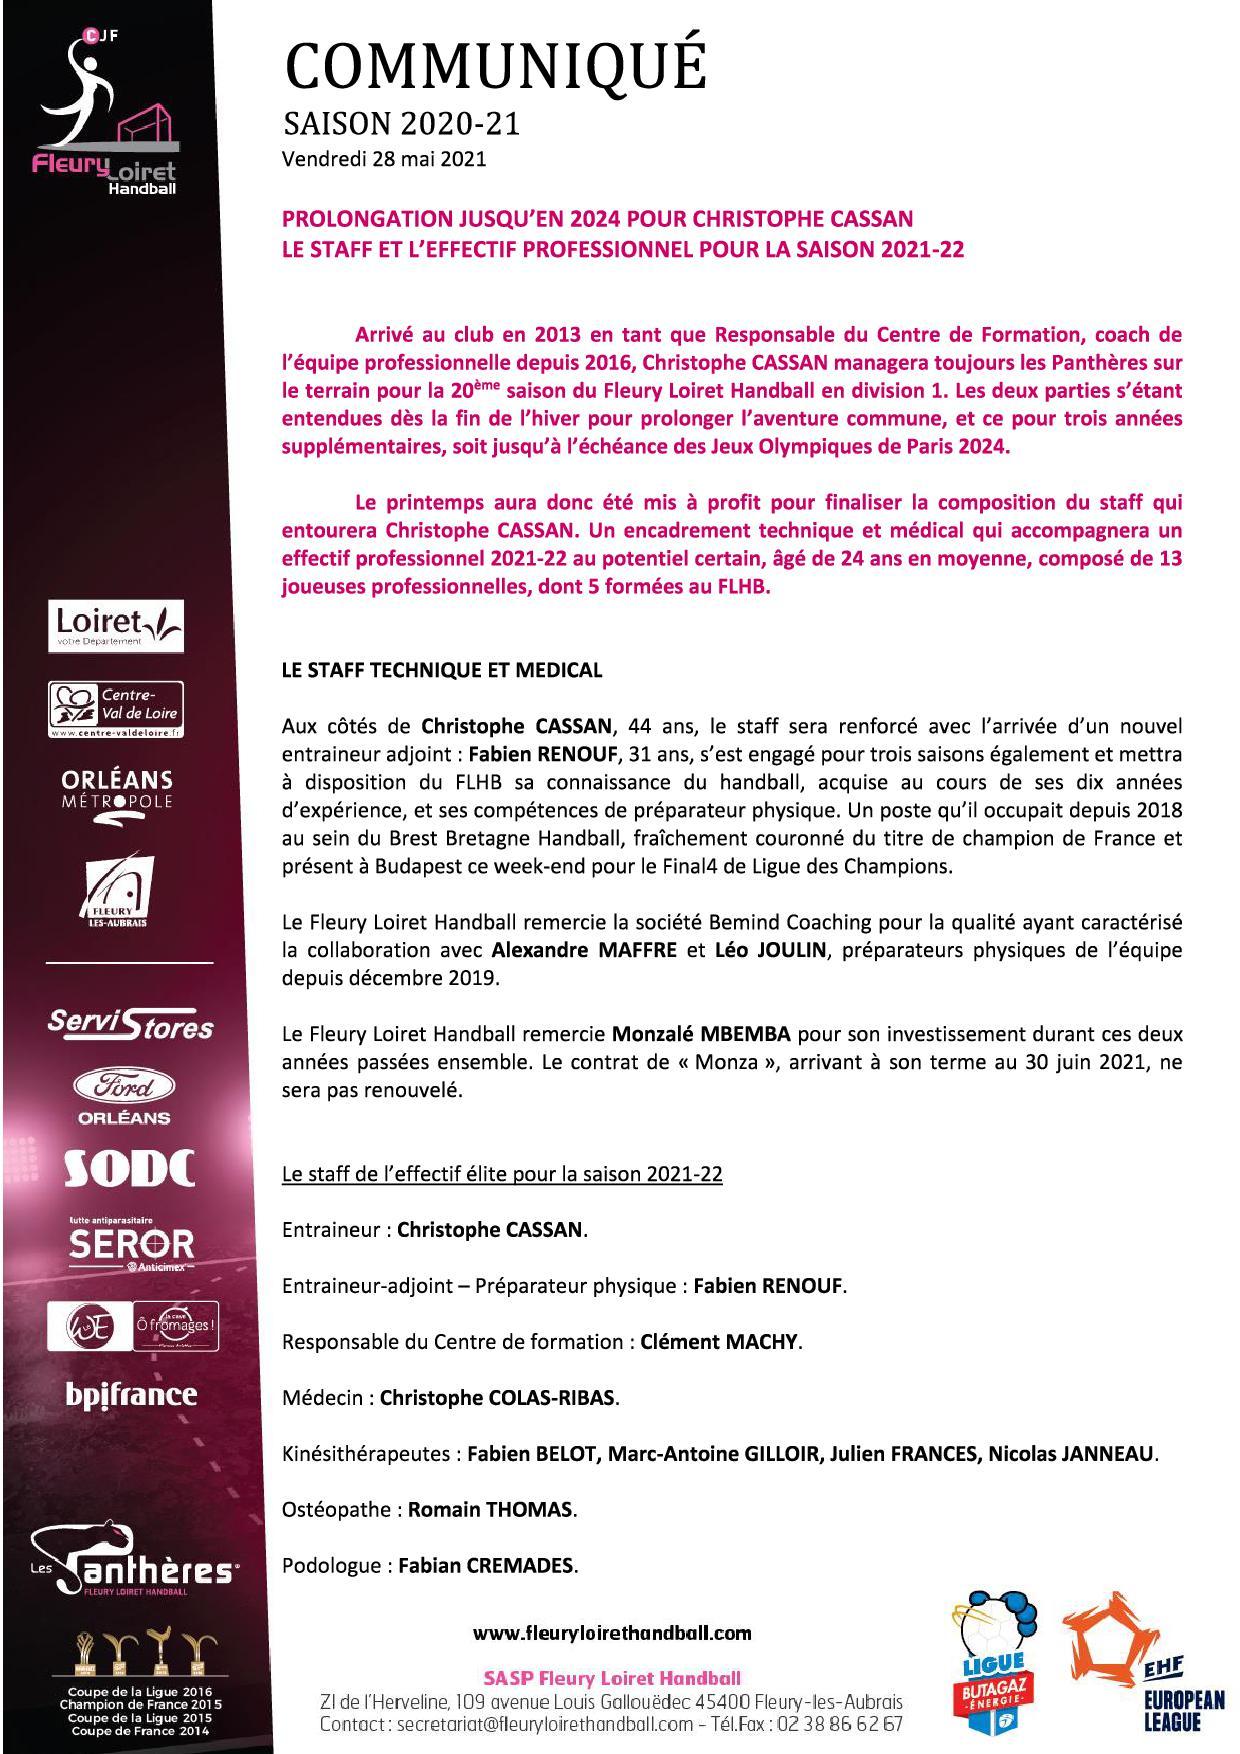 Communiqué Fleury Loiret Handball - Vendredi 28 mai 20211.jpg